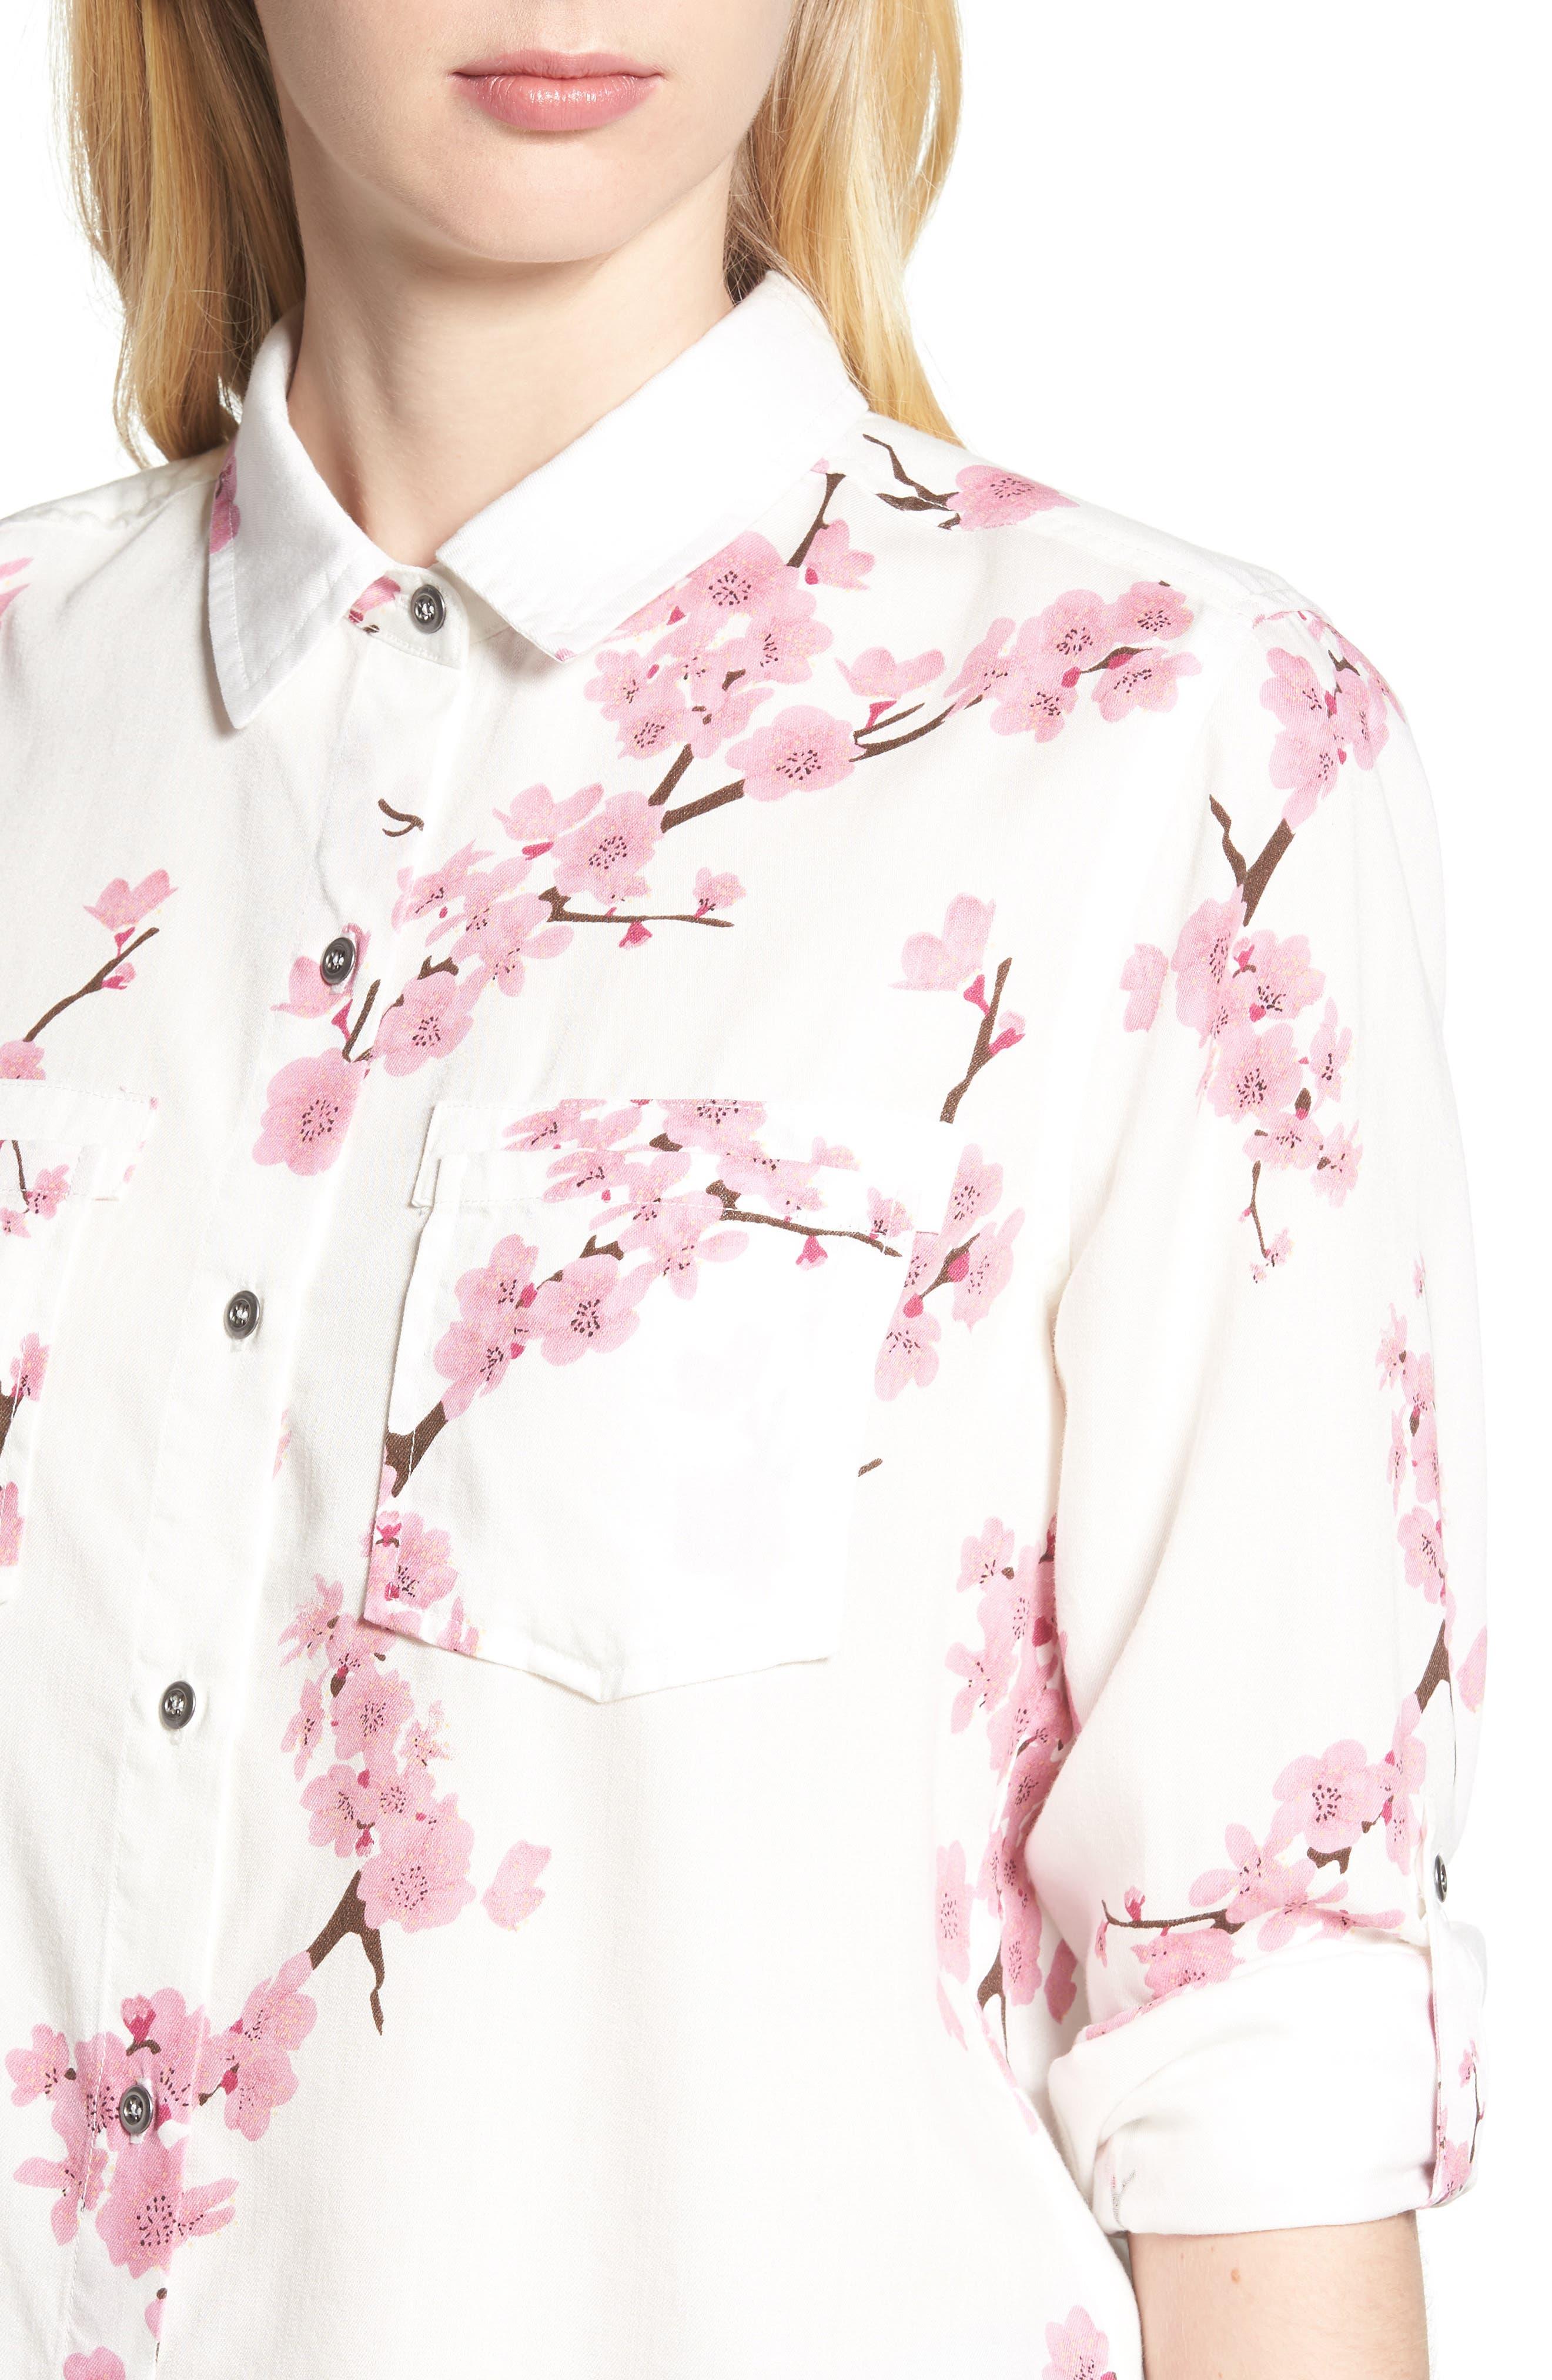 Cherry Blossom Roll Tab Sleeve Shirt,                             Alternate thumbnail 4, color,                             White Cherry Blossom